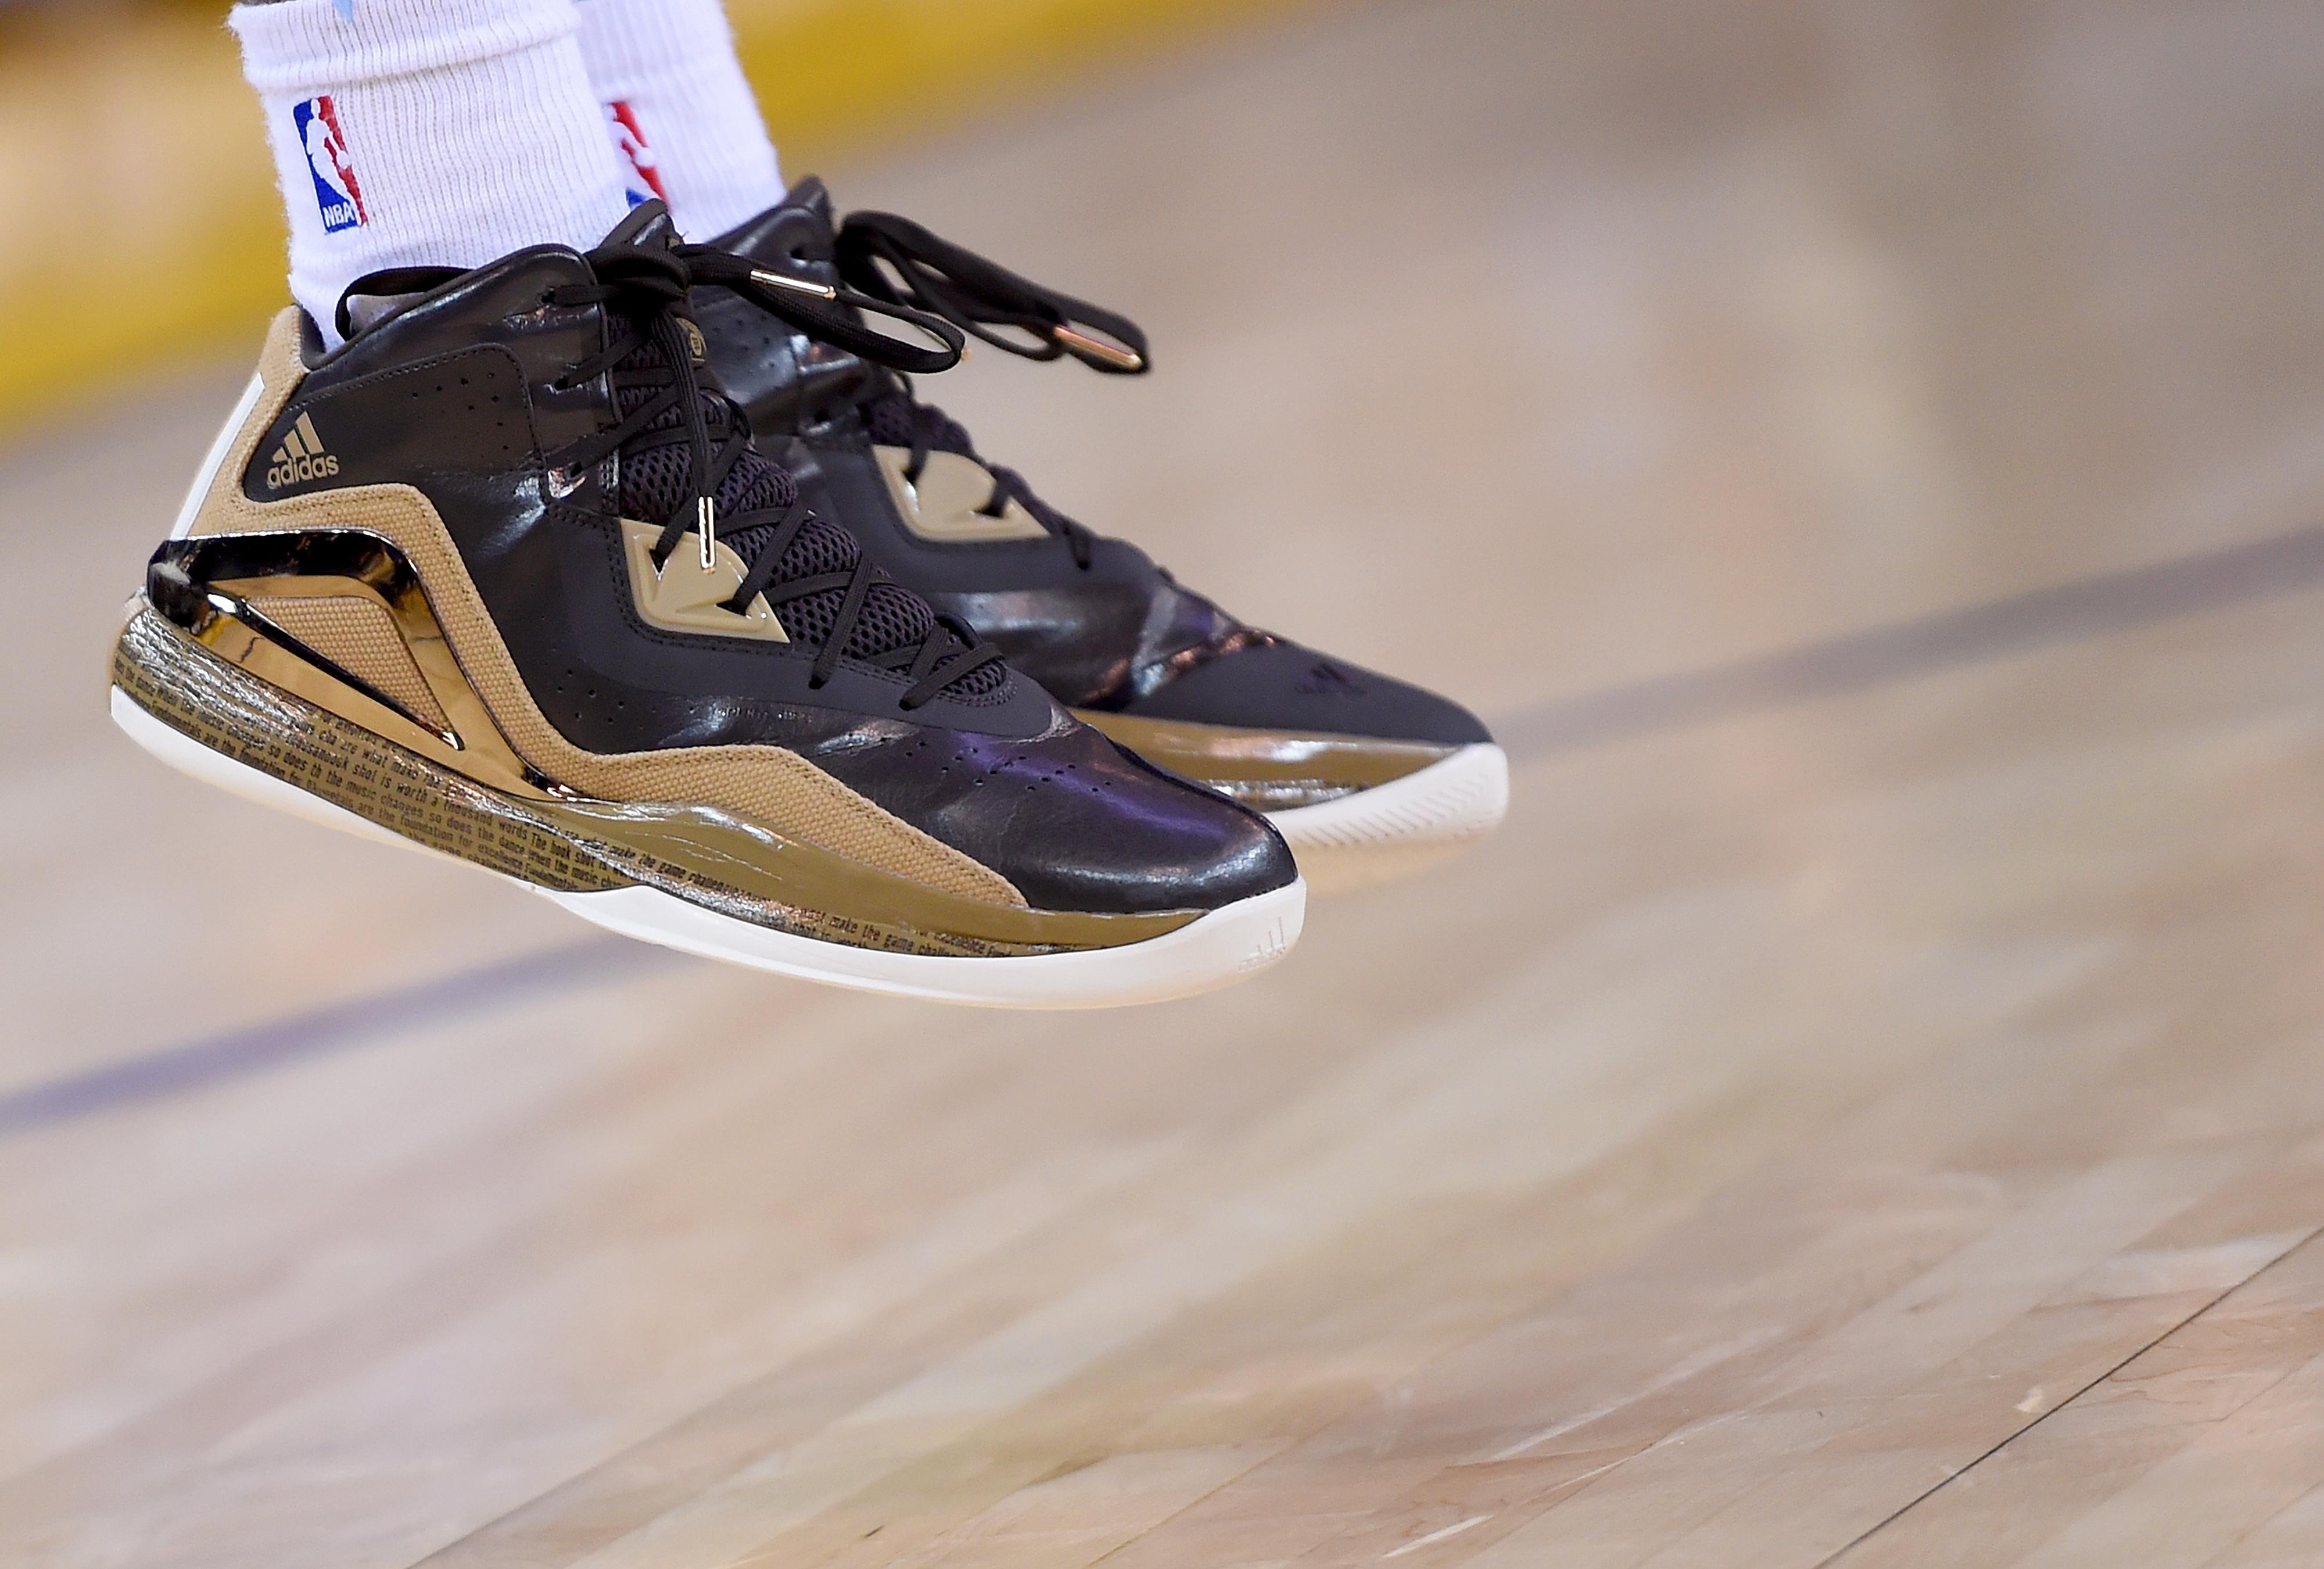 Adidas Jordan Tenis Ventas Nike Under Armor NBA